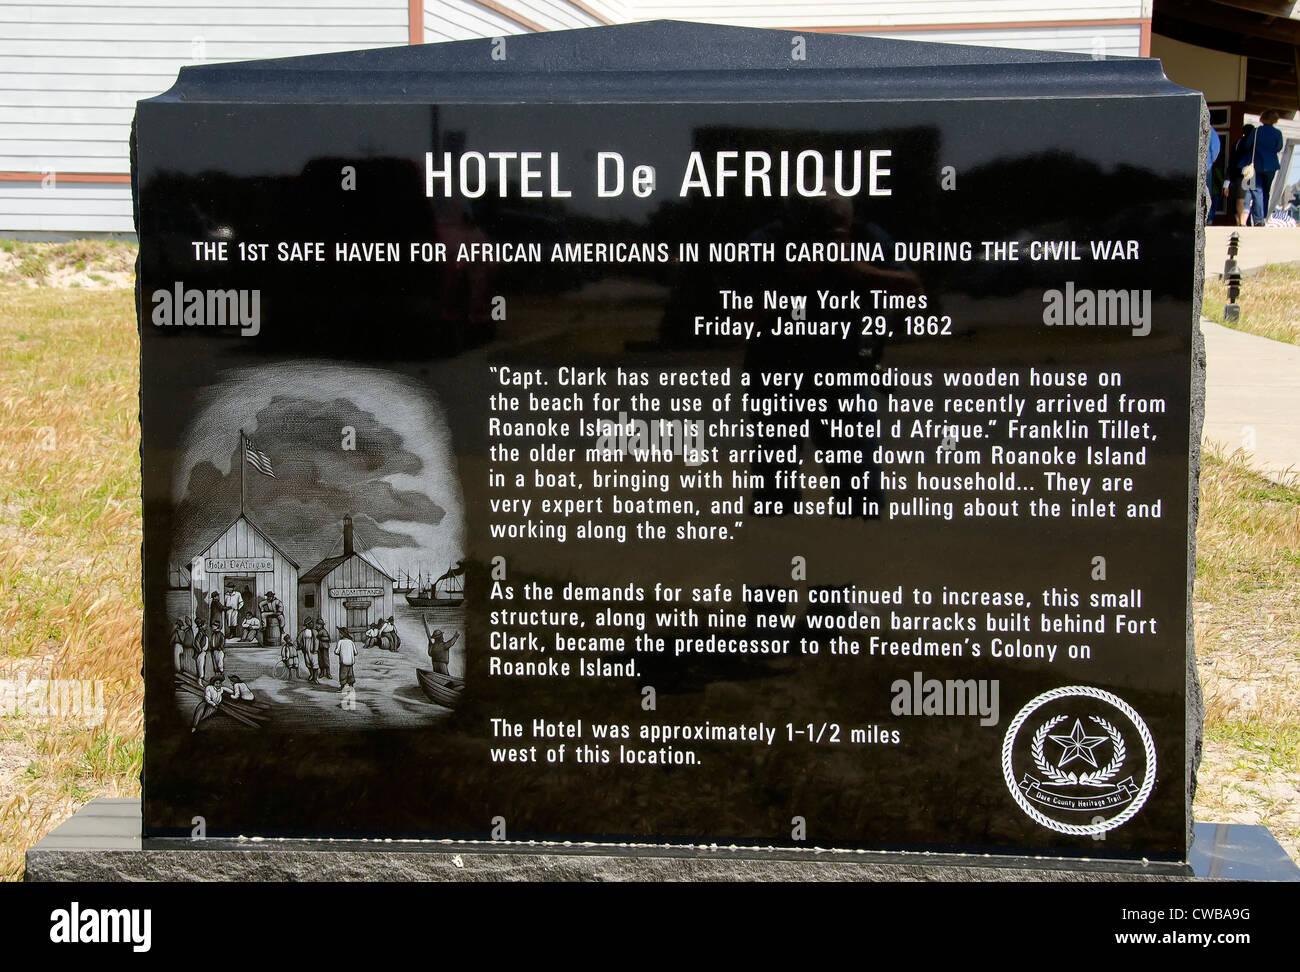 Hotel de Afrique monument Civil War era hotel for freed slaves, Graveyard of Atlantic Museum, Hatteras, Outer Banks, - Stock Image